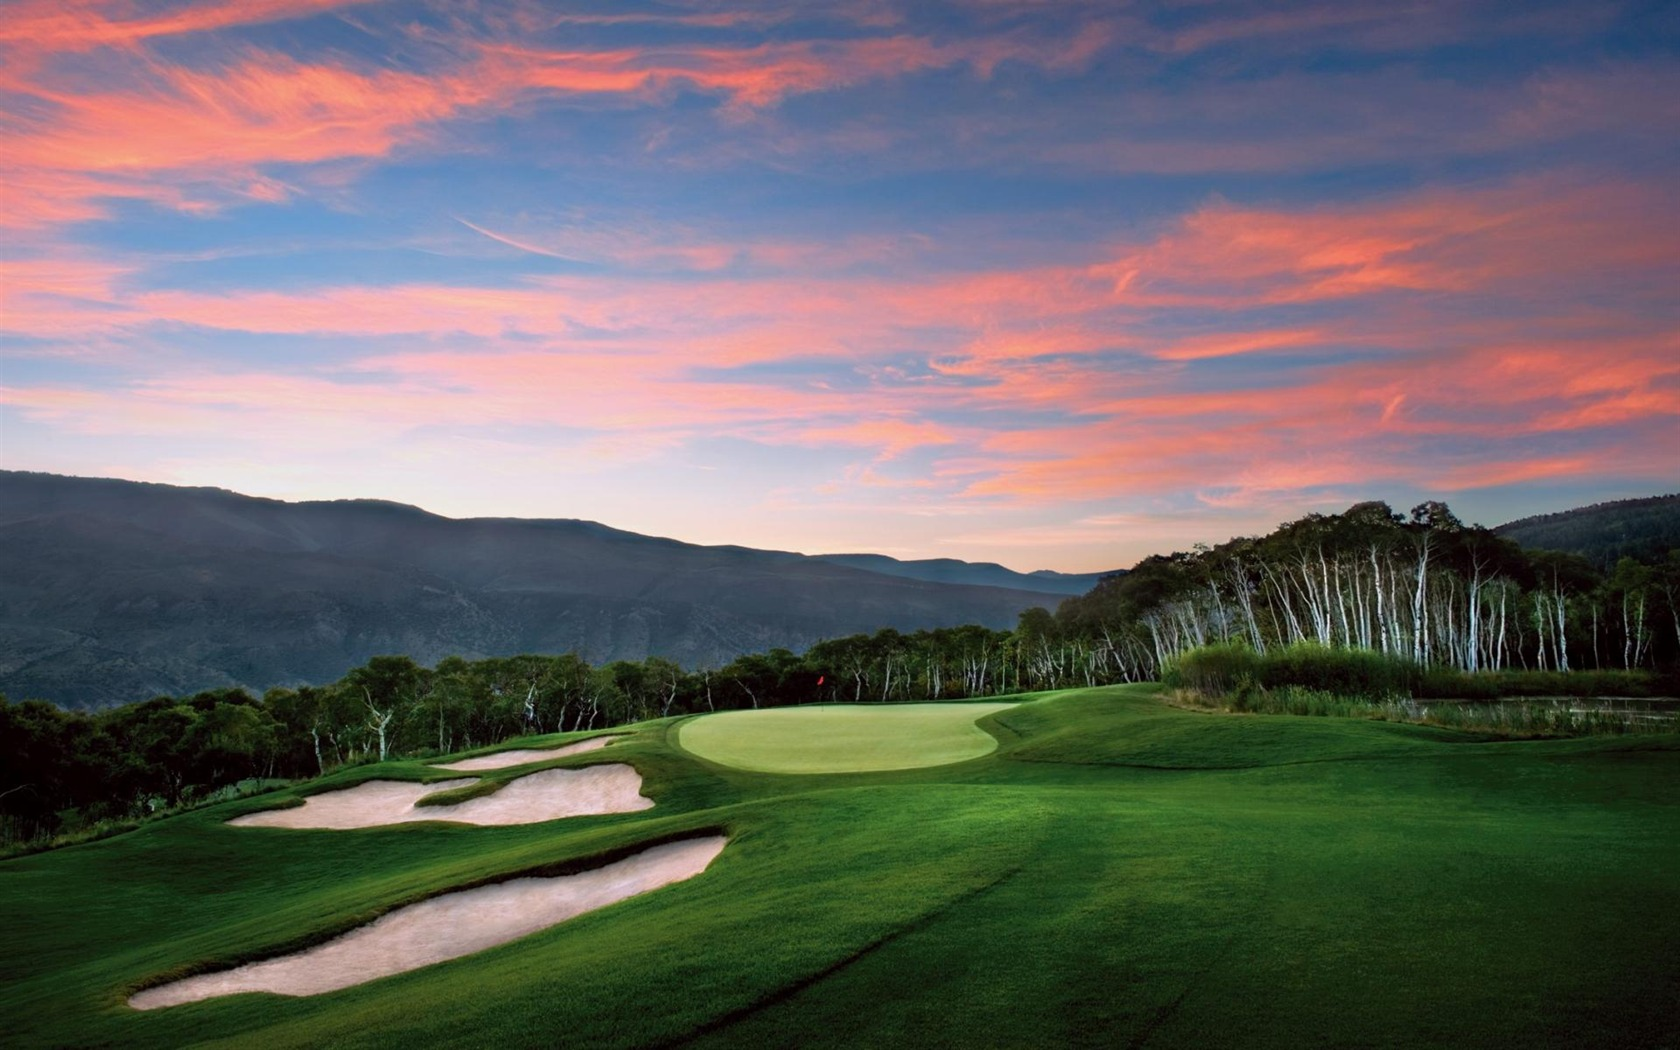 golf courses world beautiful scenery wallpaper 1680x1050 wallpaper 1680x1050